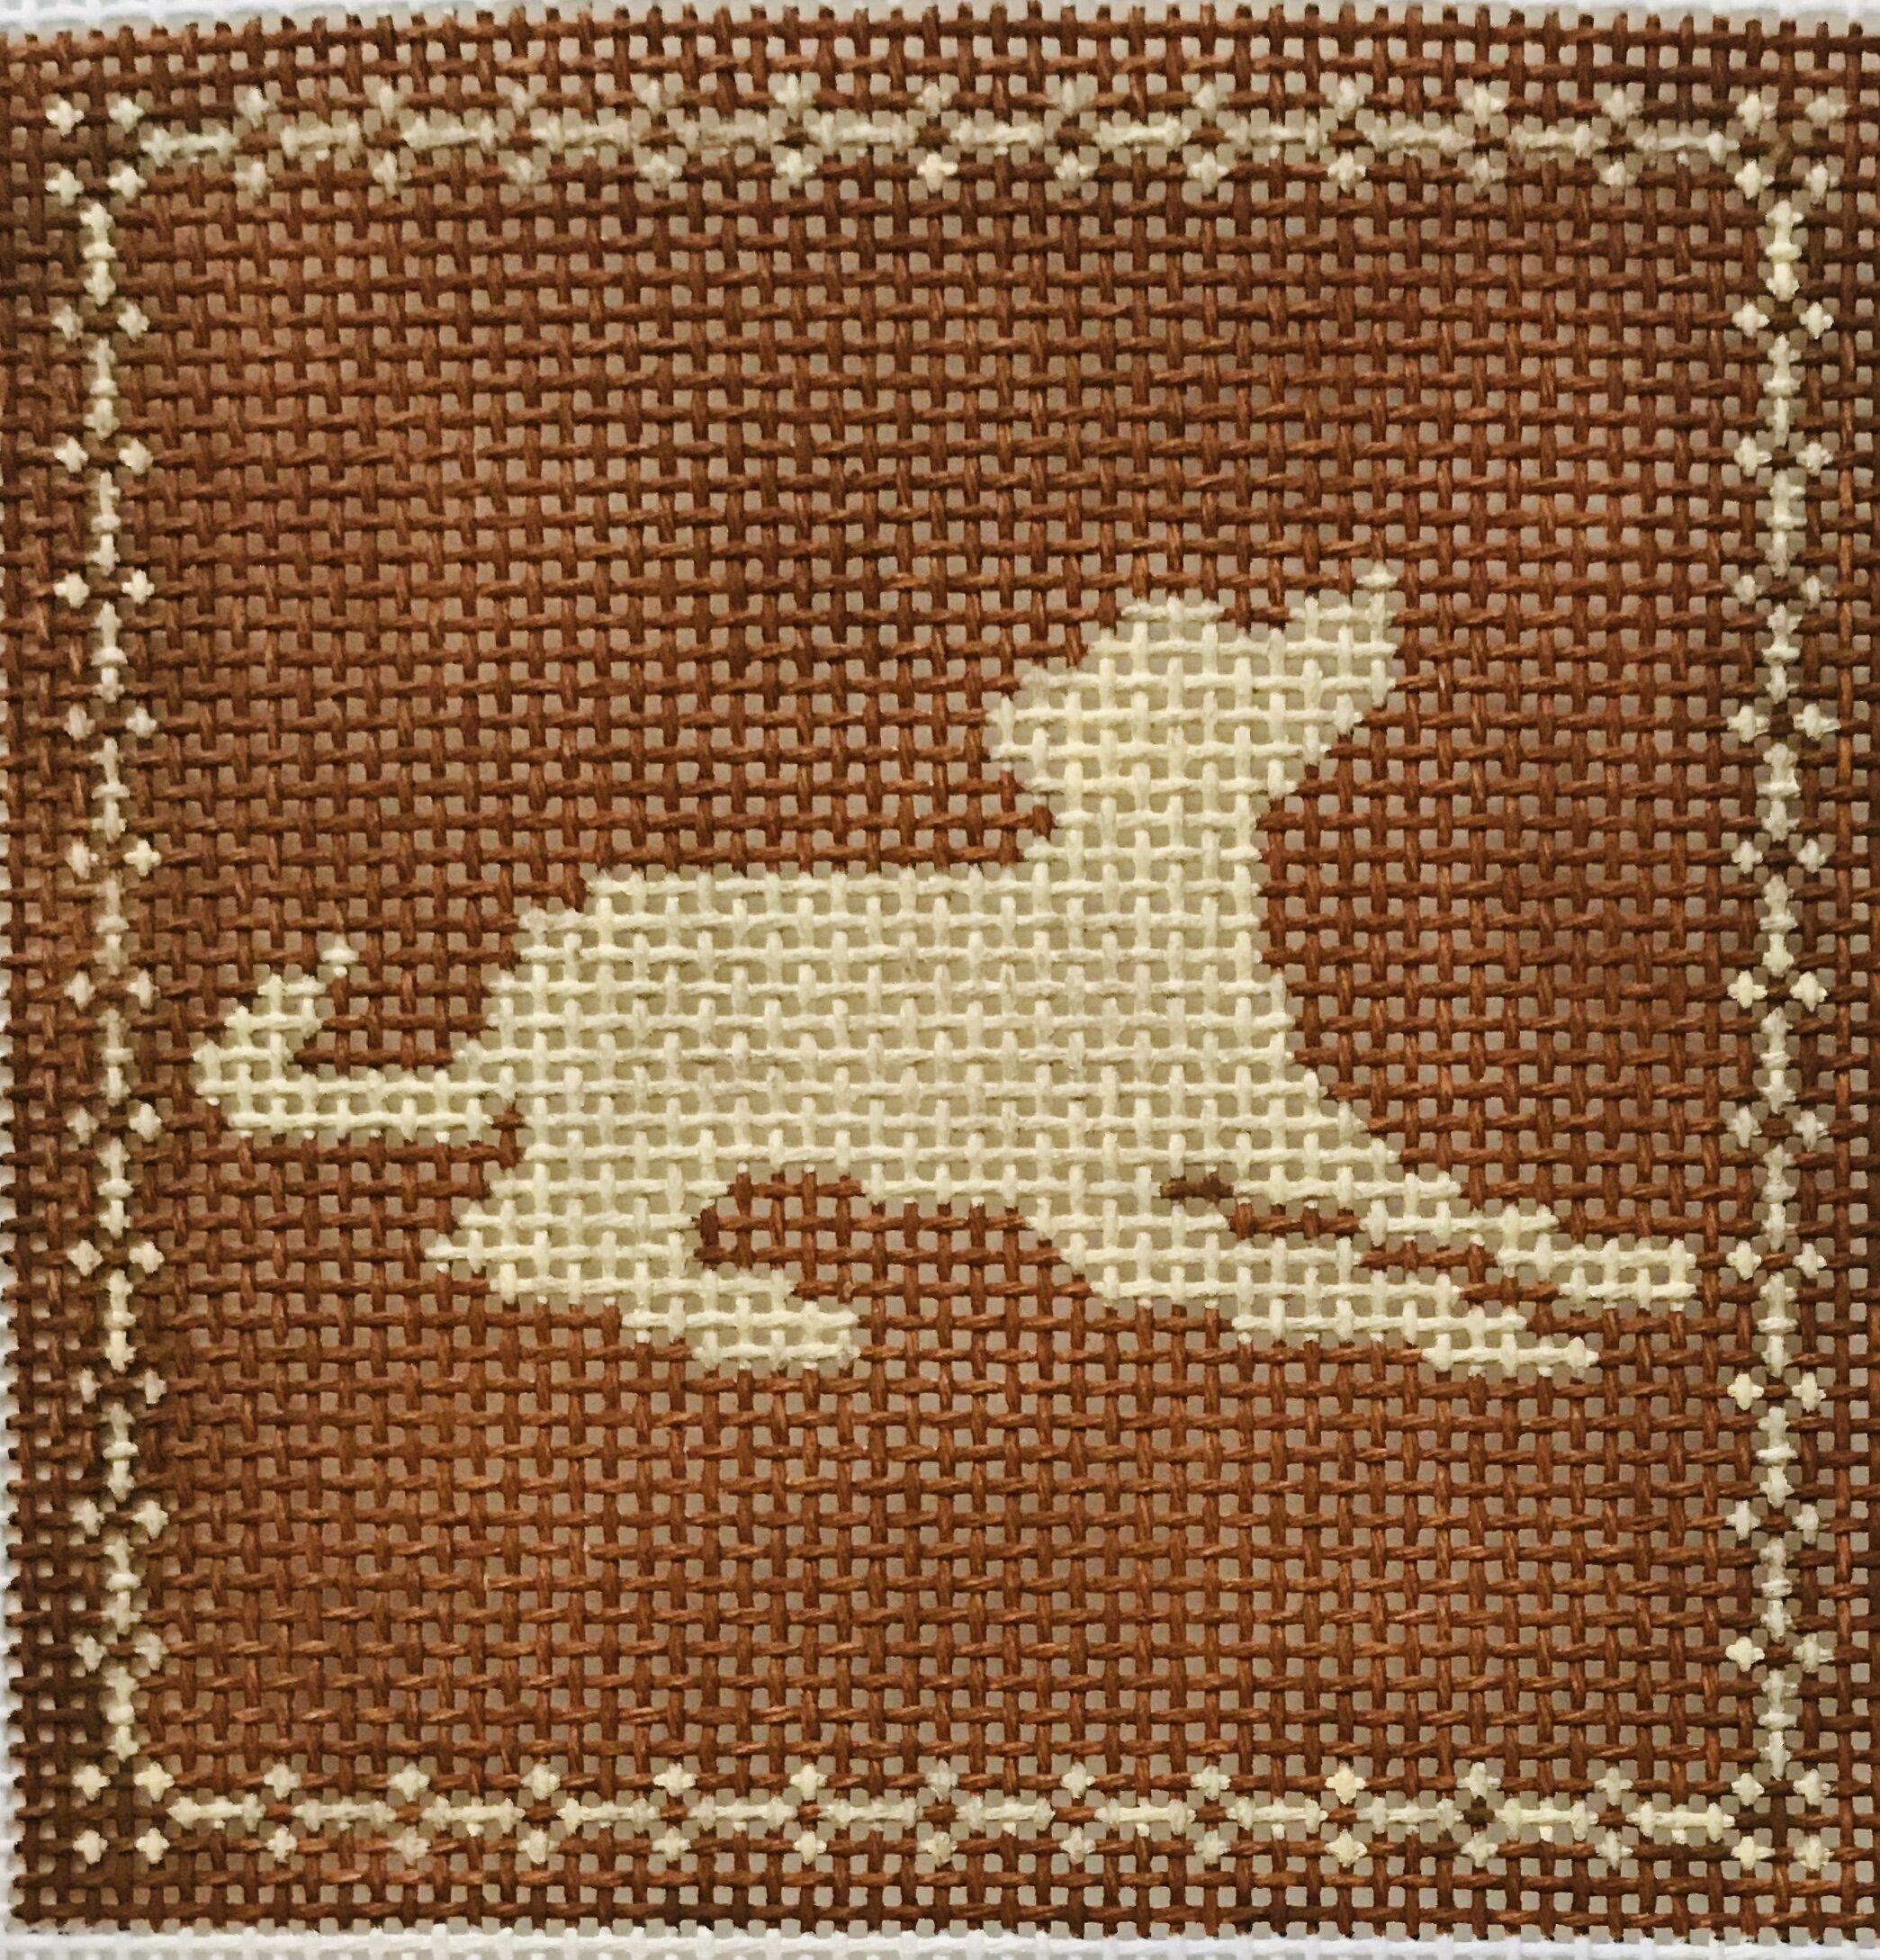 "Laying Labrador AL108   4"" x 4"" on 14 mesh"